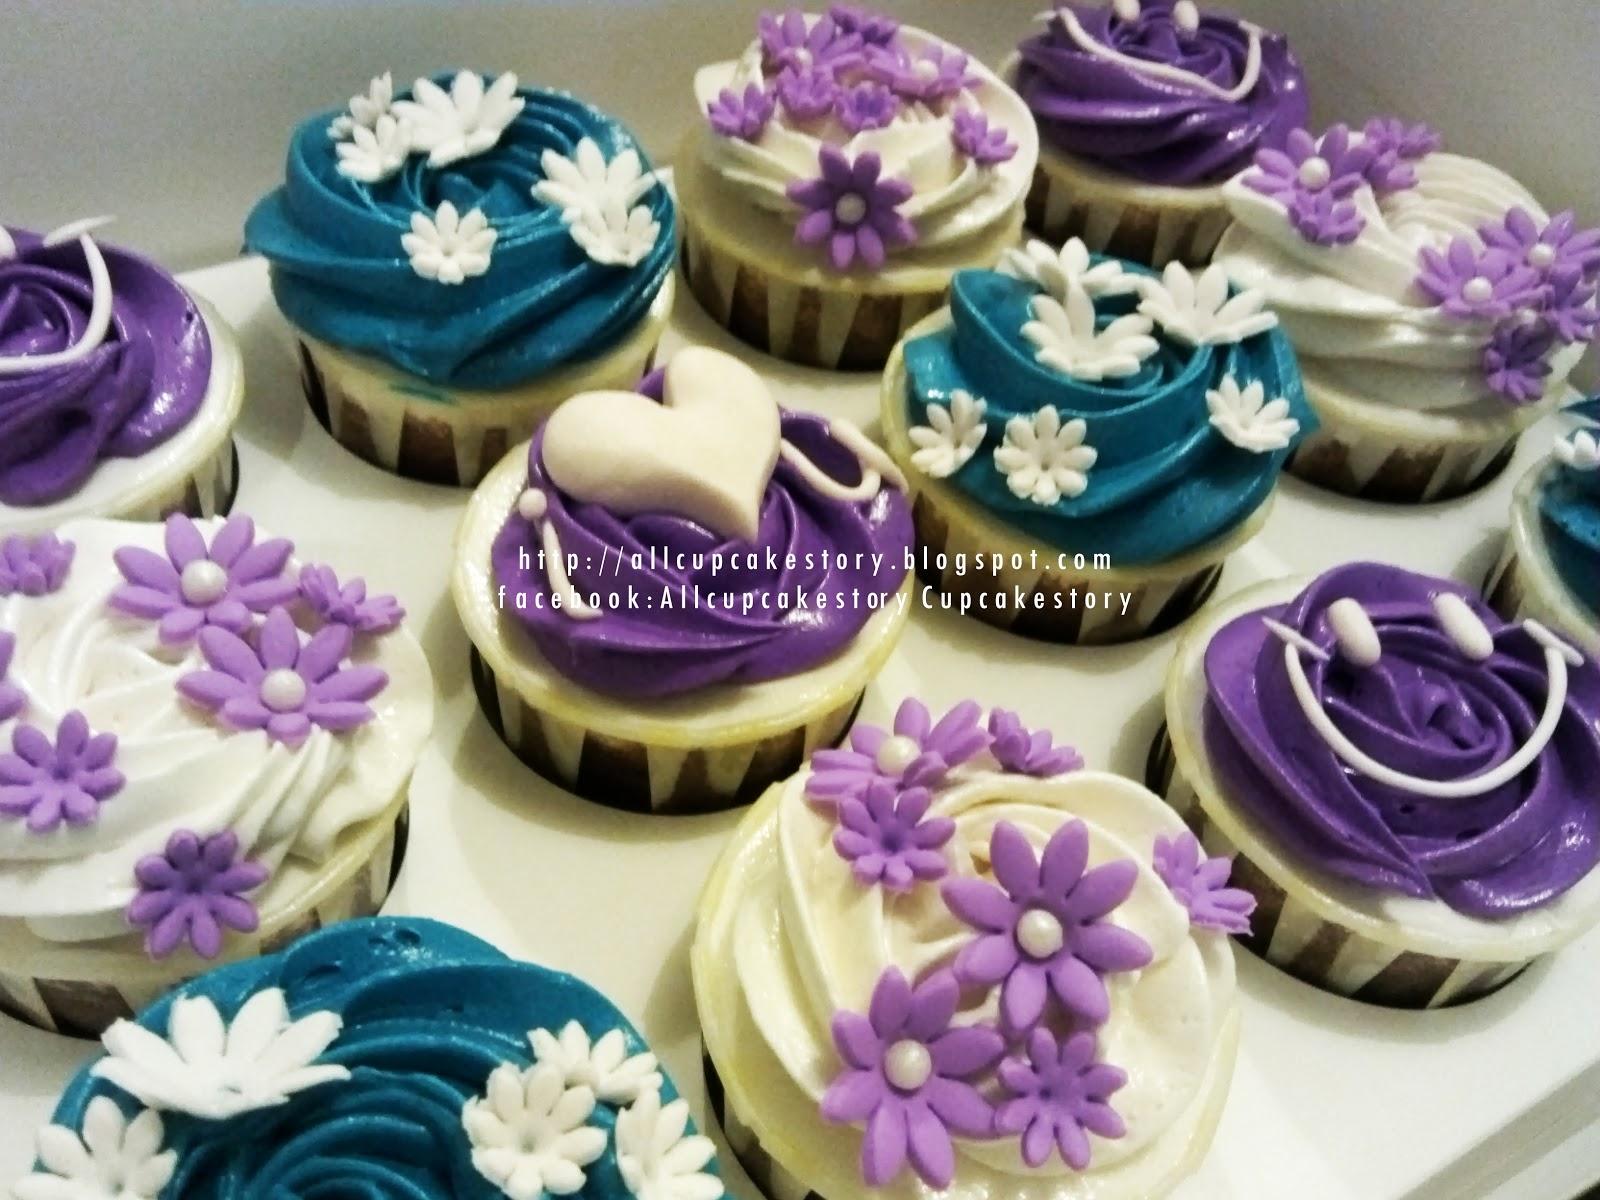 allcupcakestory Purple Blue & White Sweet Cupcakes